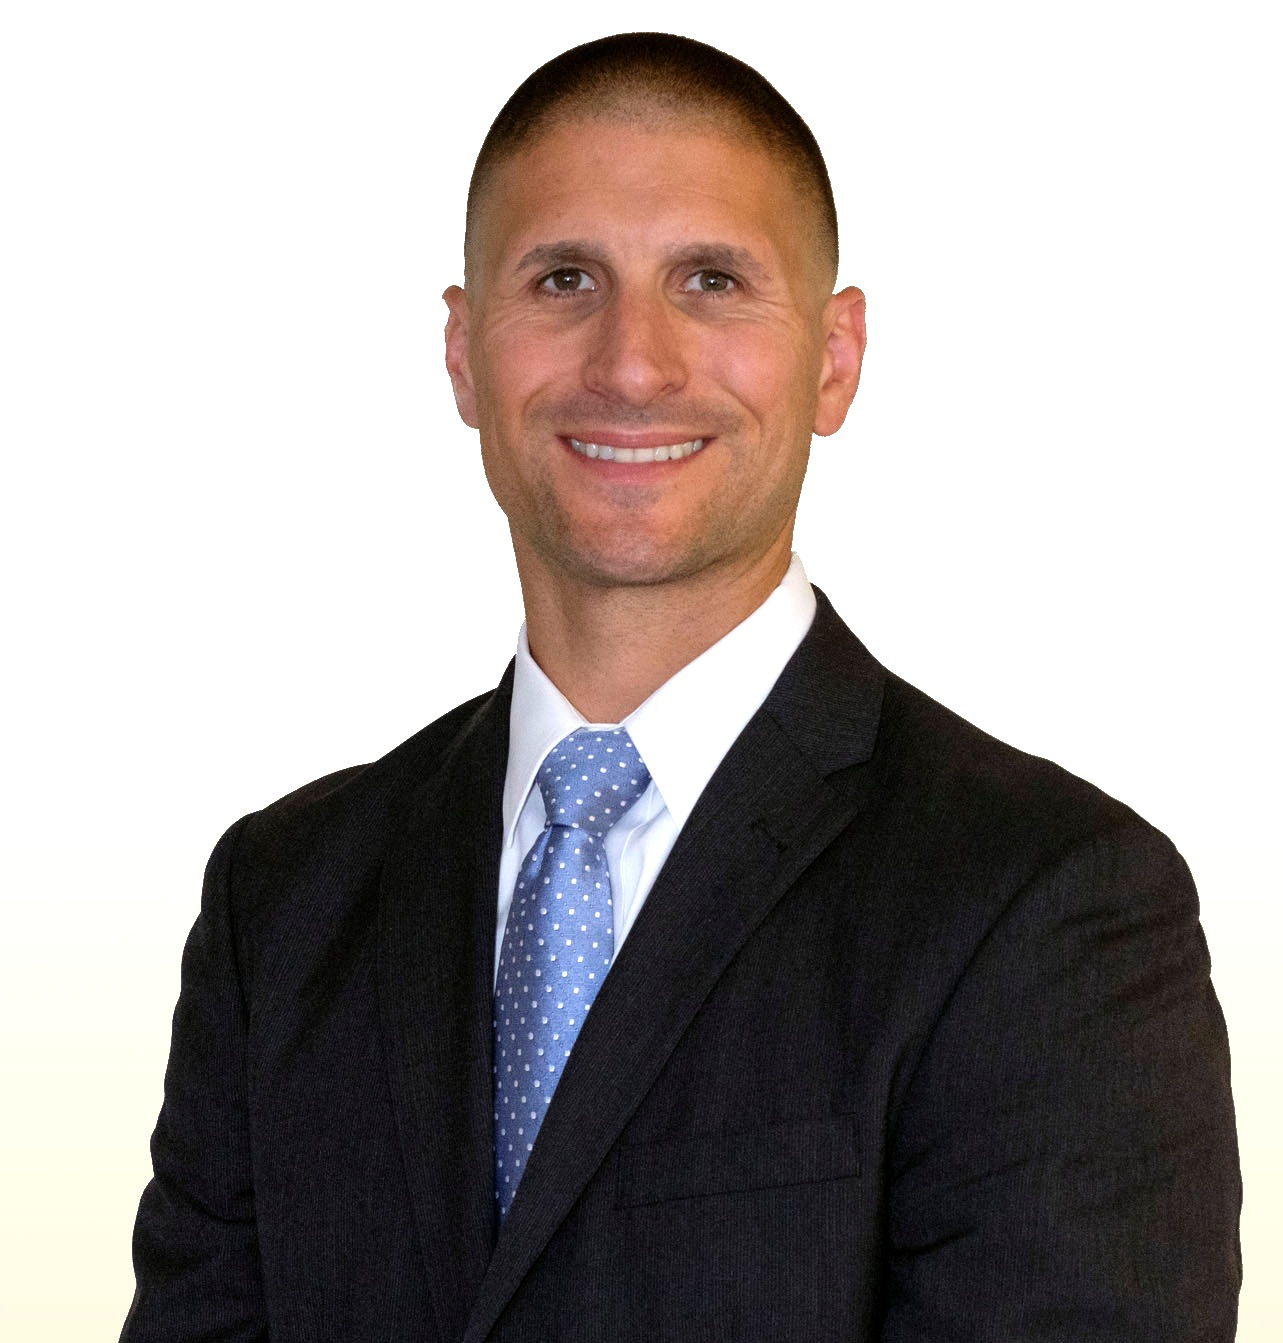 Paul Cordasco, COO